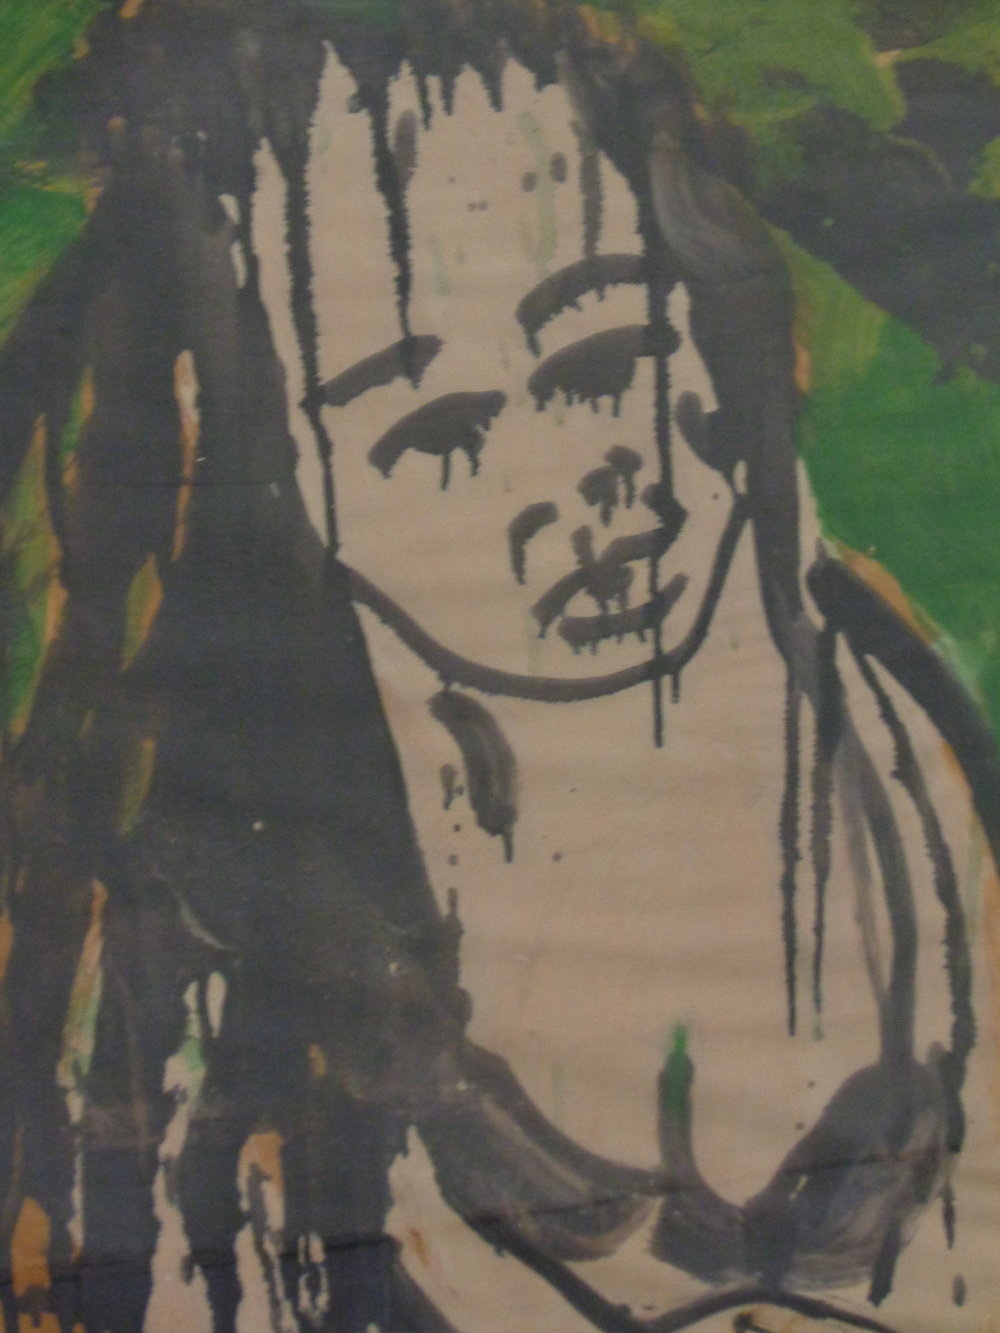 Sunoko with Black Bra - Oil on paper 2013